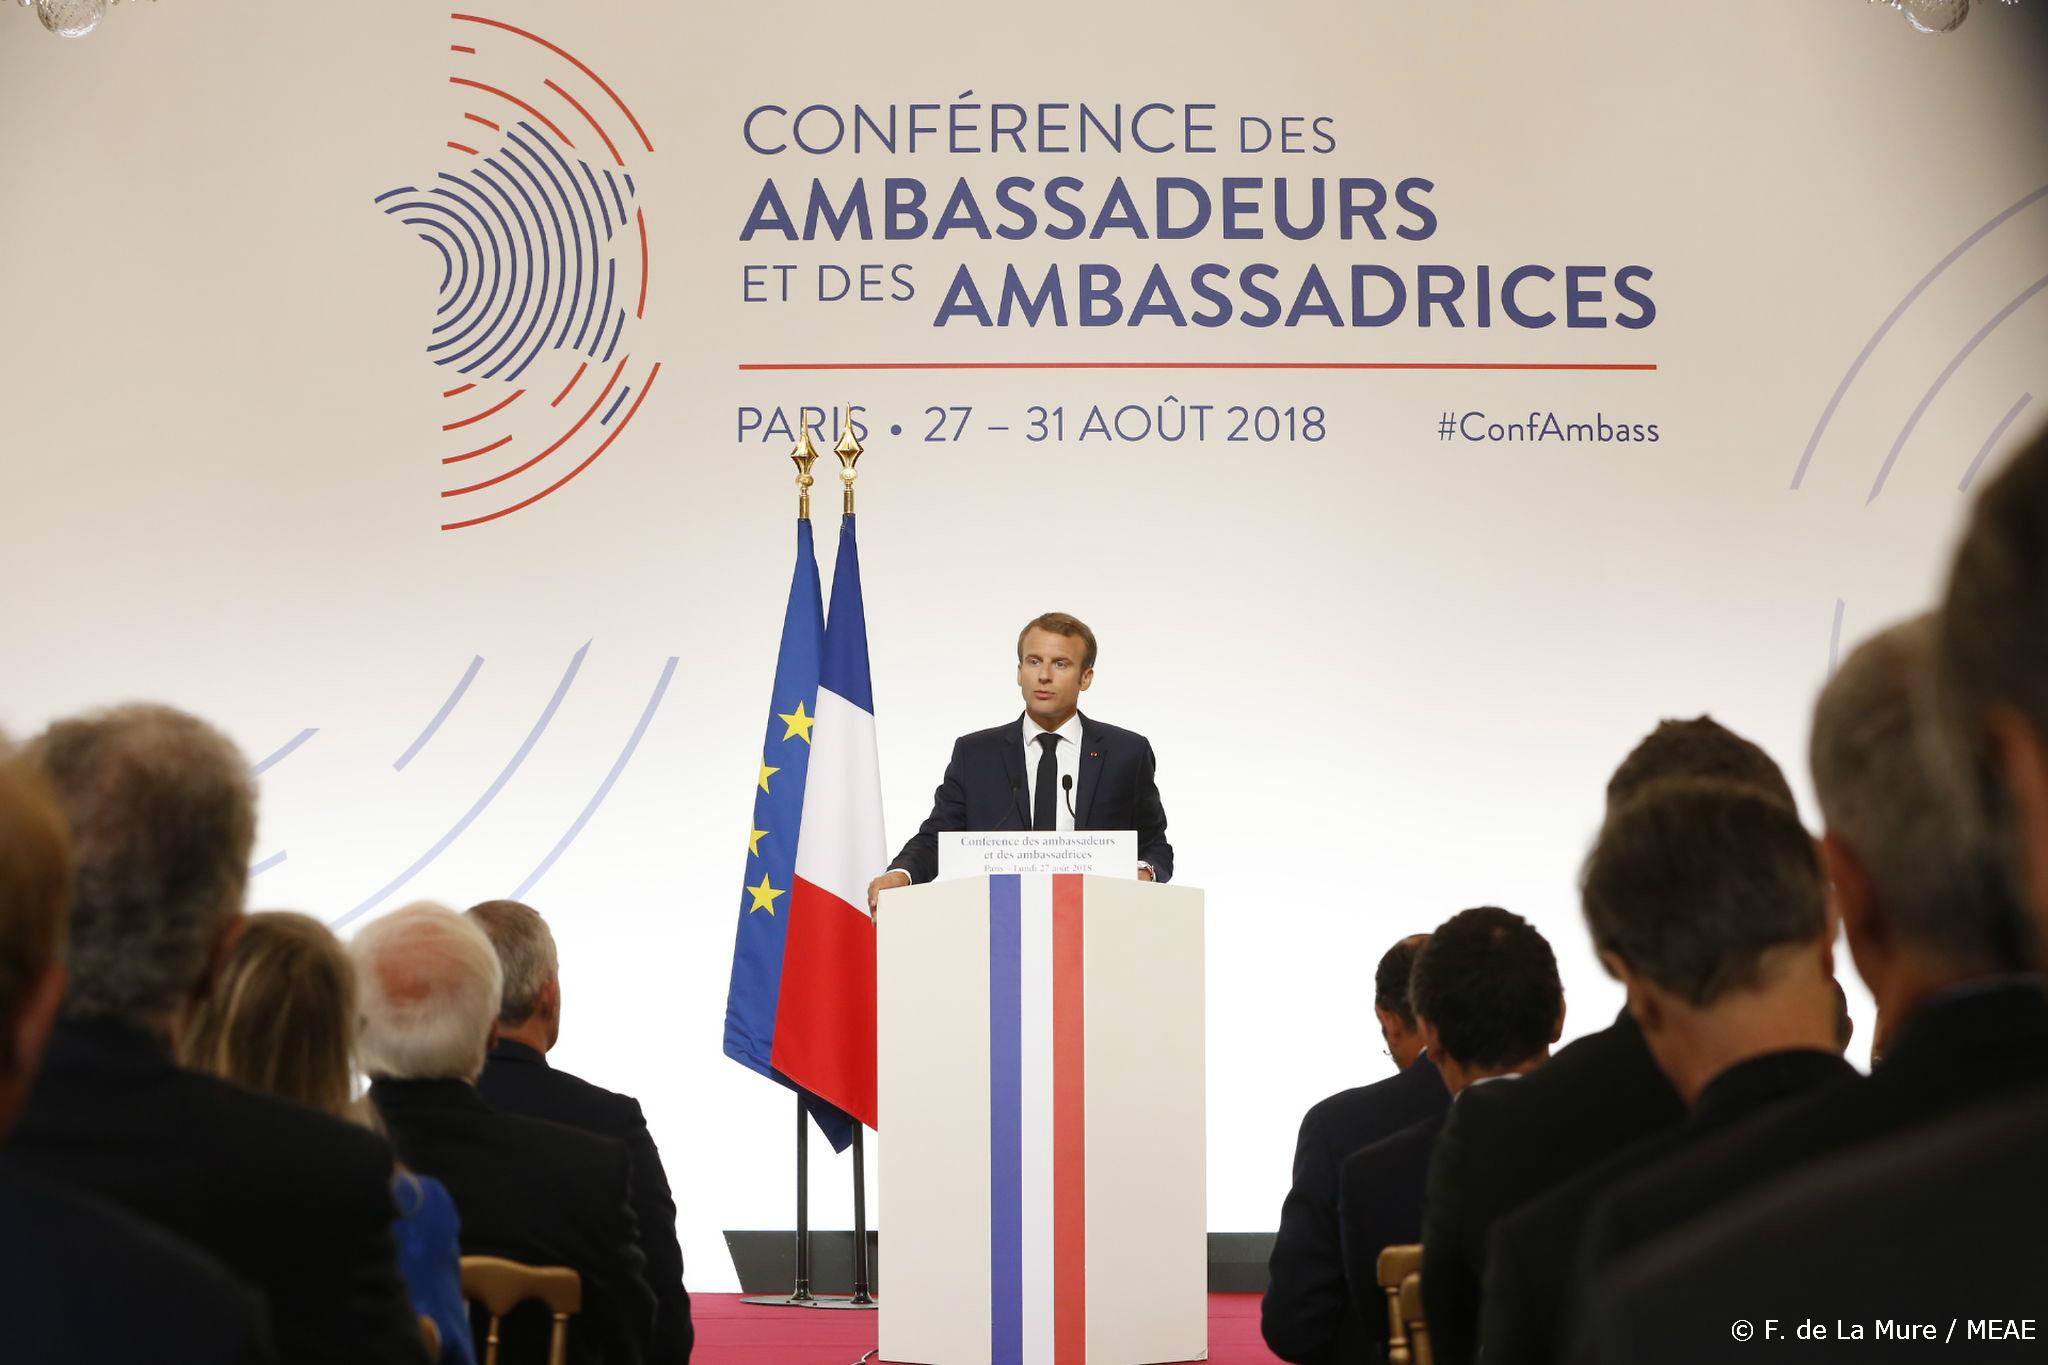 Conférence des ambassadeurs - 2018